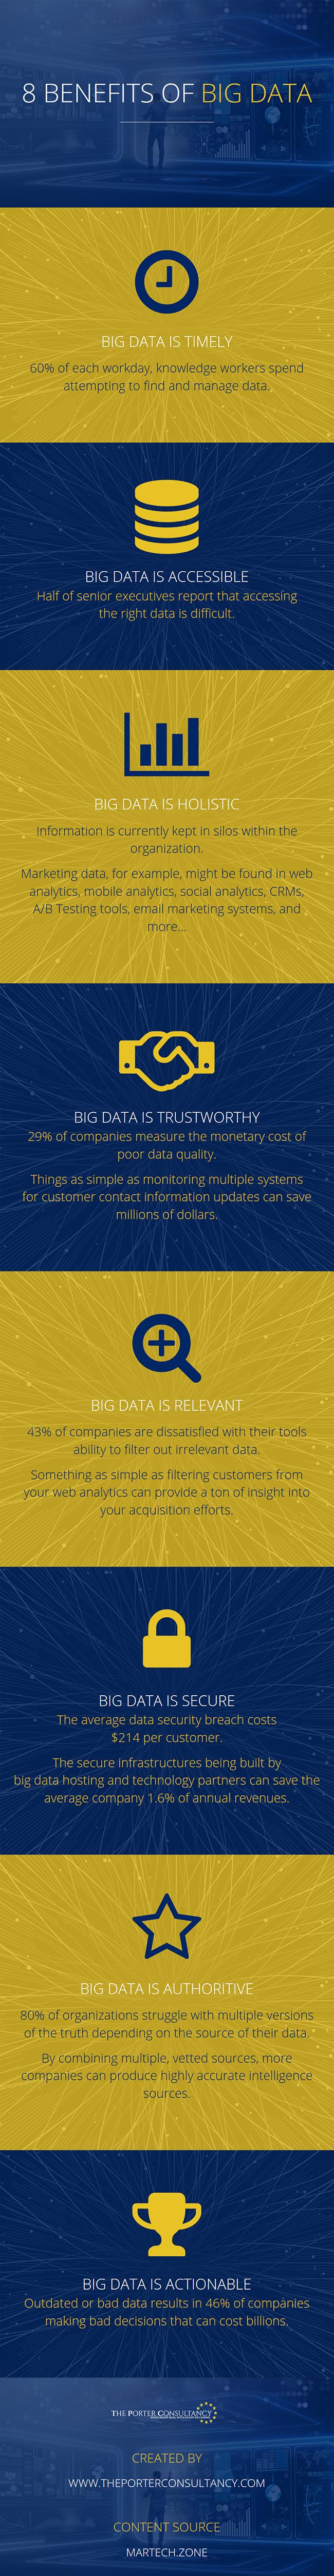 8 Benefits of Big Data